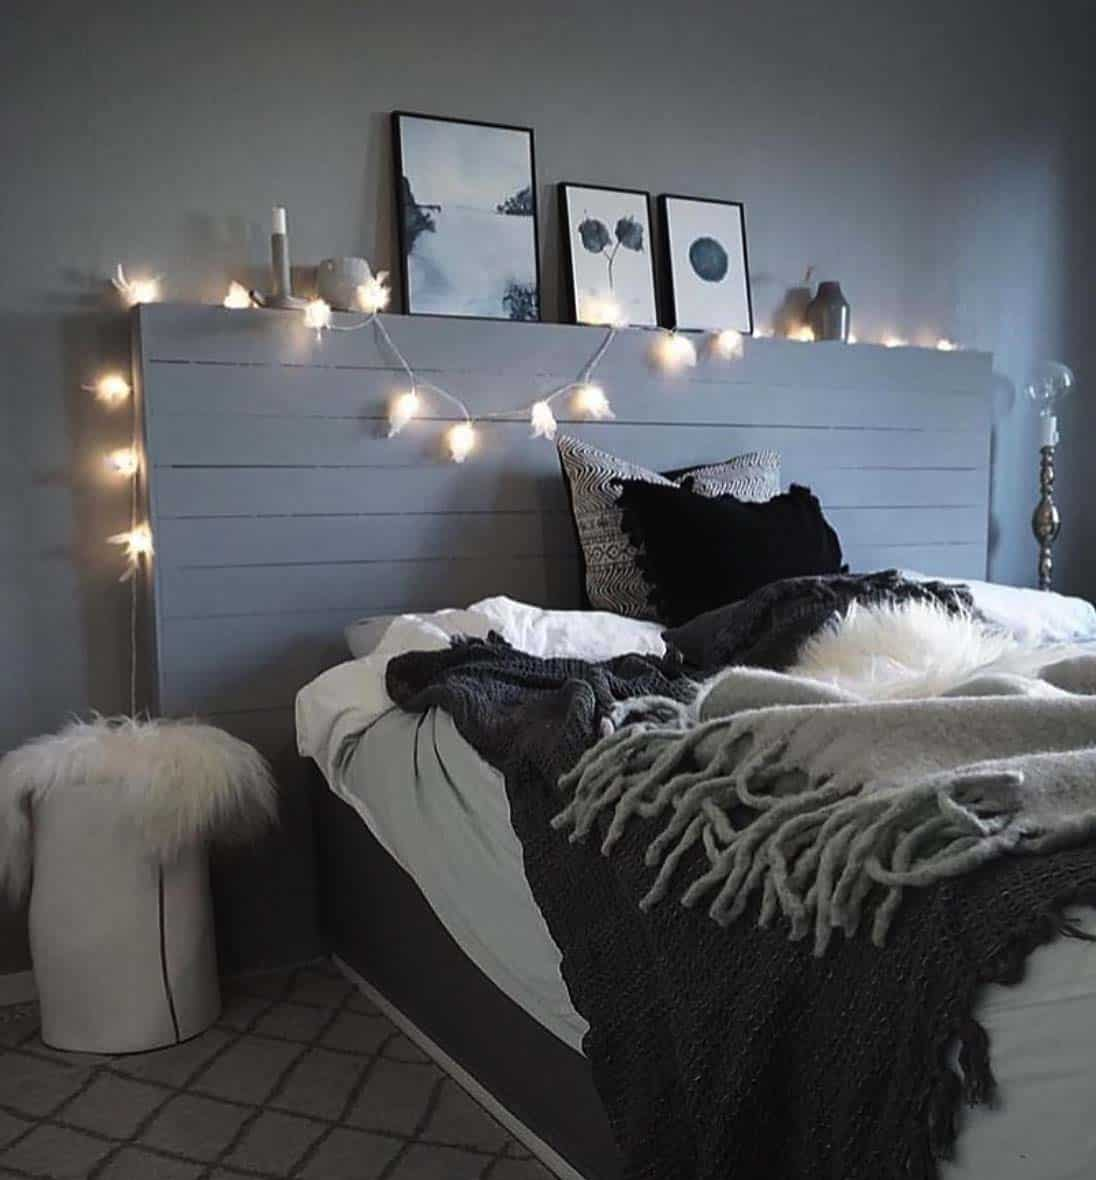 33 Ultra-cozy bedroom decorating ideas for winter warmth on Cozy Teenage Room Decor  id=13082